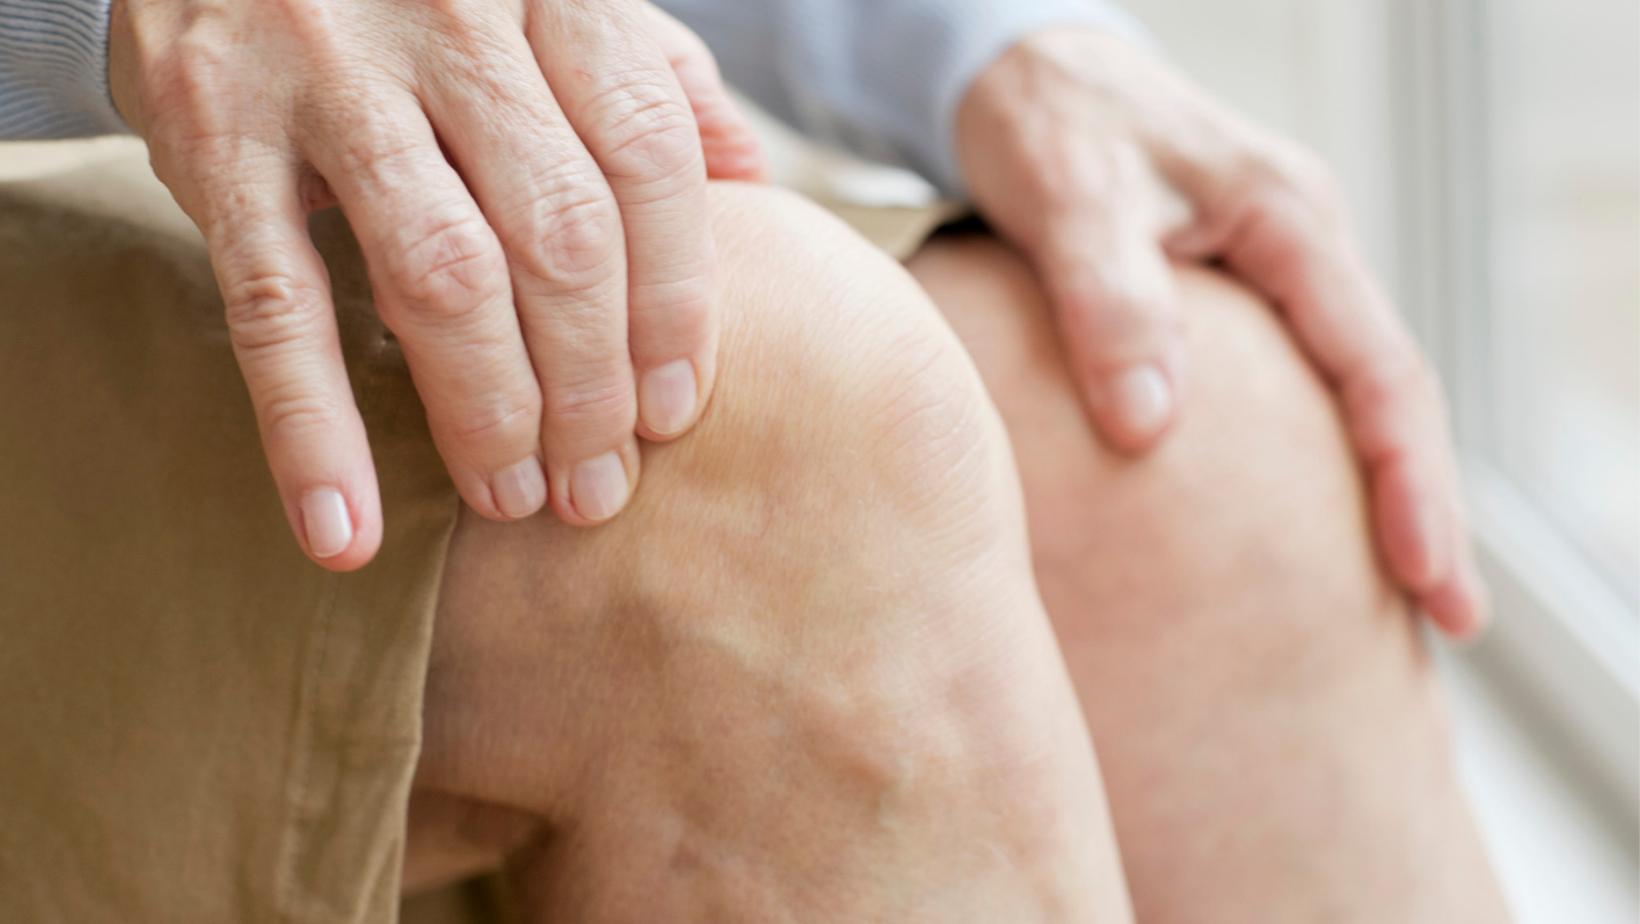 Moc menopausa osteoporosi - Santabarbara Hospital